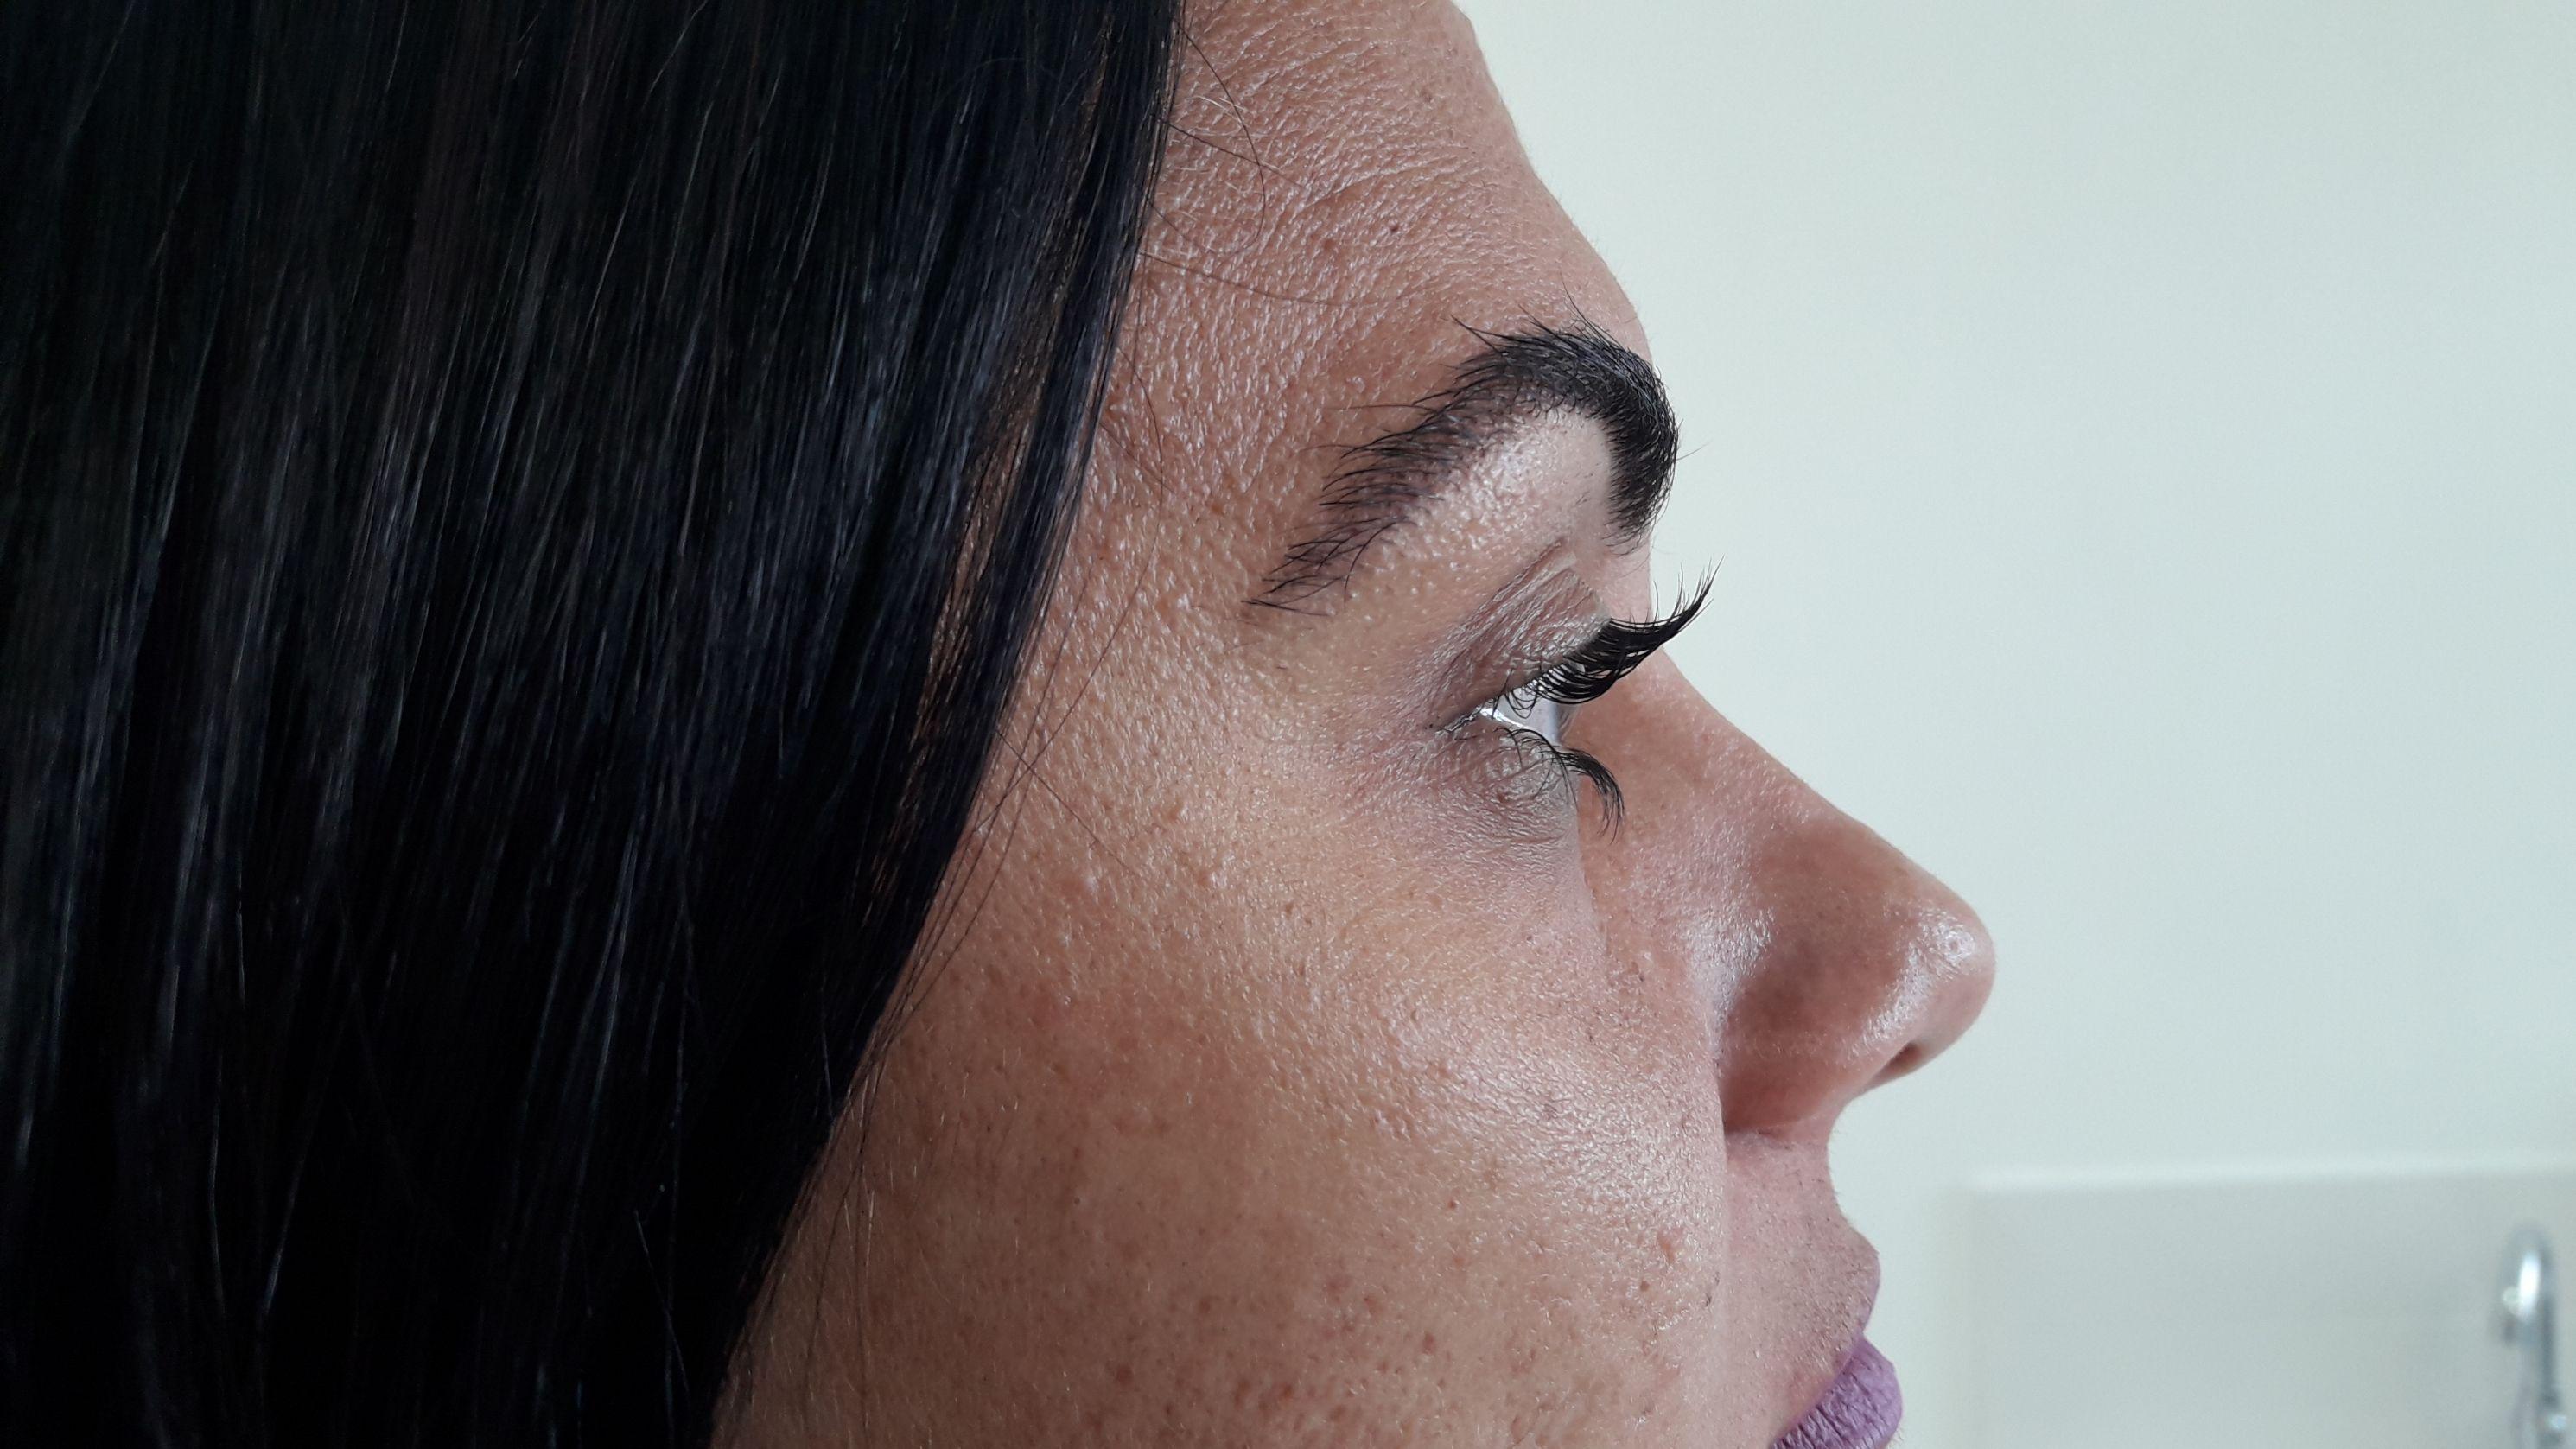 Embelezamento do olhar Lifting nos cílios micropigmentador(a) designer de sobrancelhas esteticista